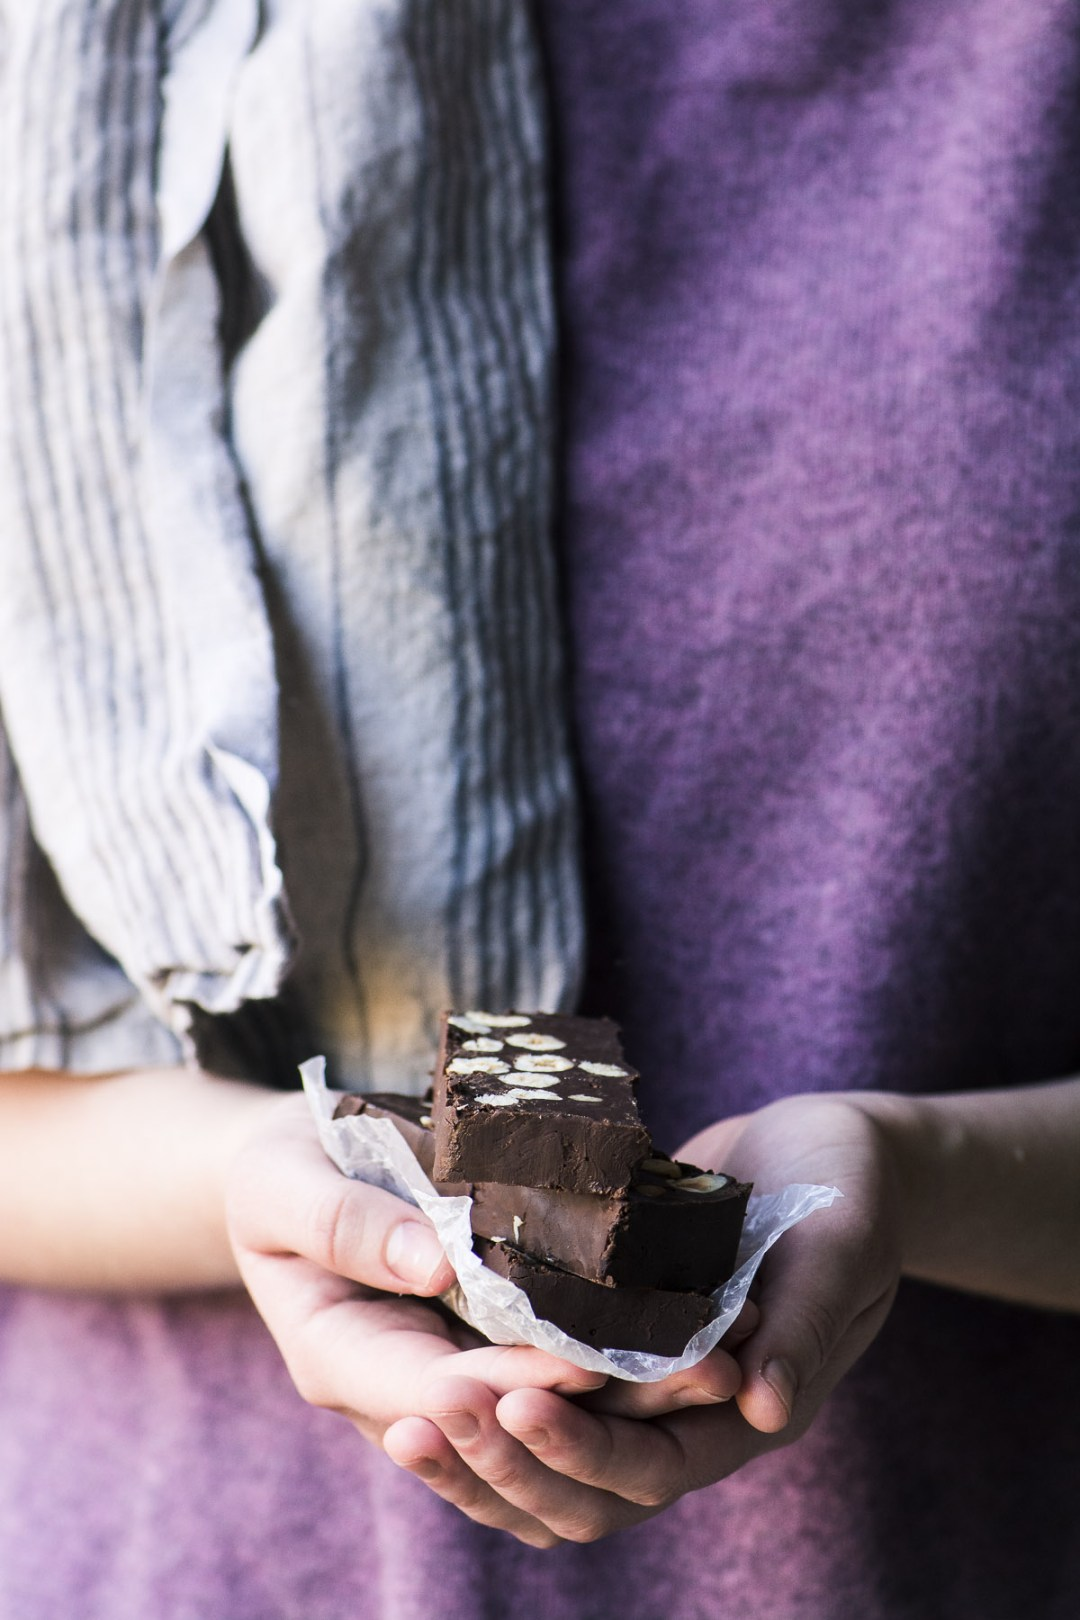 Holding a stack of chocolate hazelnut torrone slices